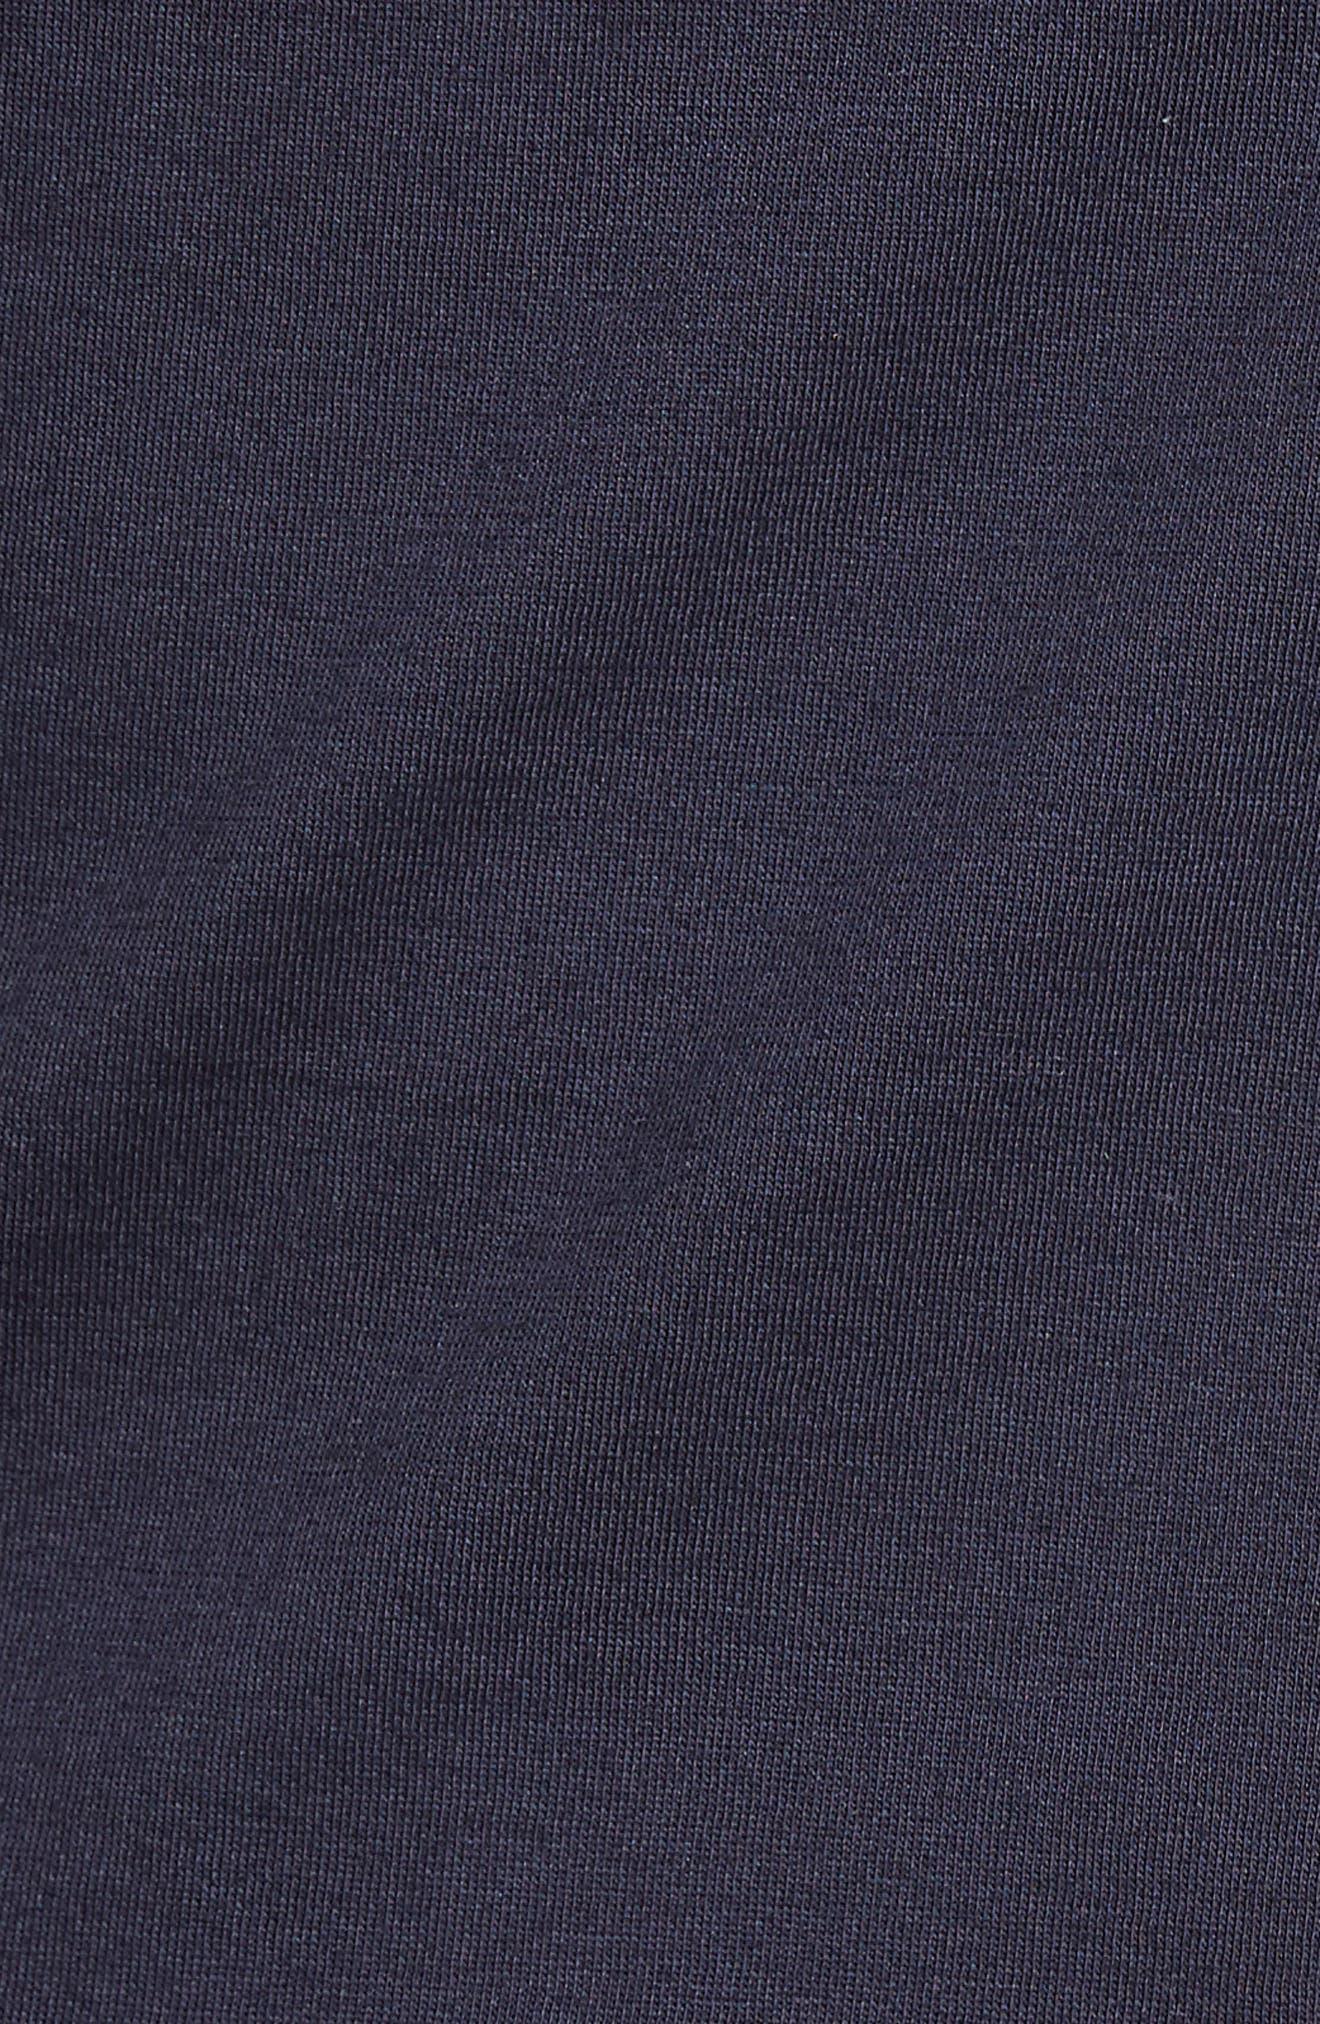 Short Sleeve Cotton Tee,                             Alternate thumbnail 58, color,